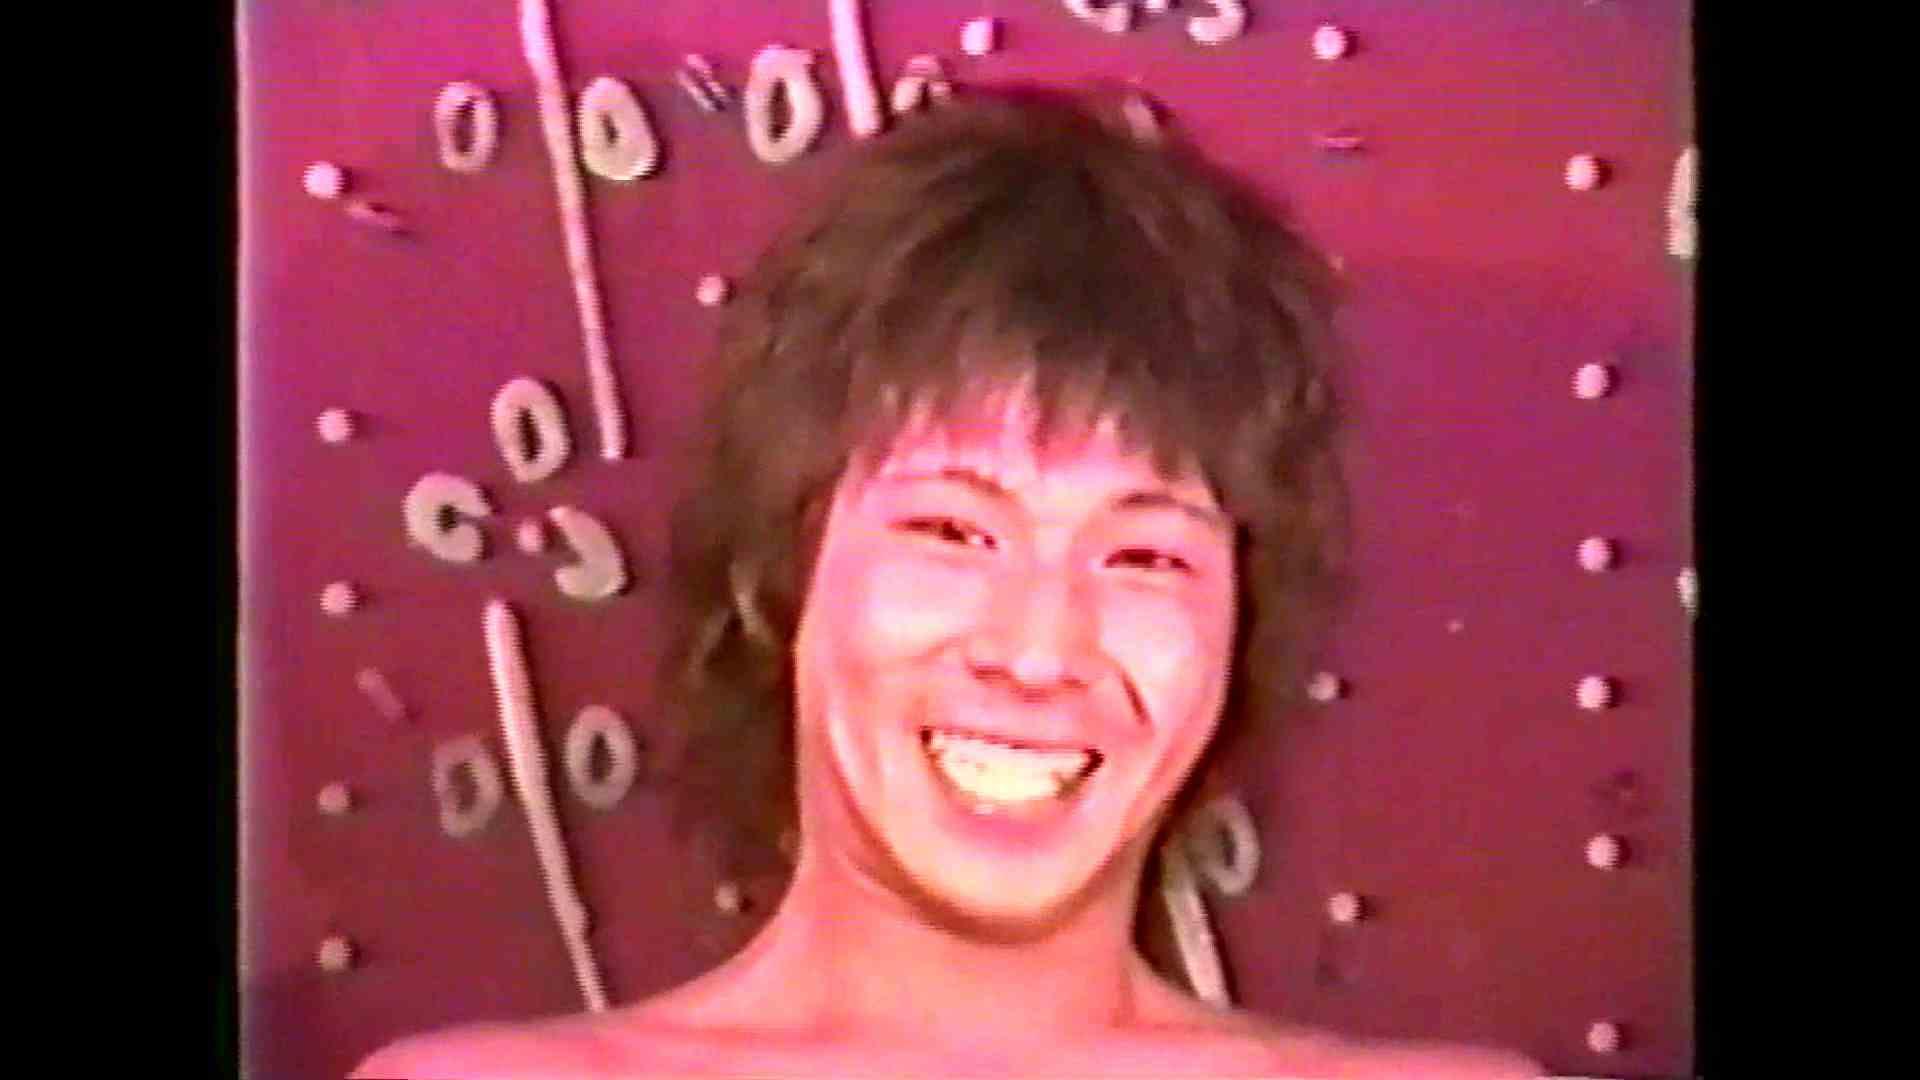 GAYBOY宏のオカズ倉庫Vol.3-4 お手で! ゲイ無修正画像 91pic 82